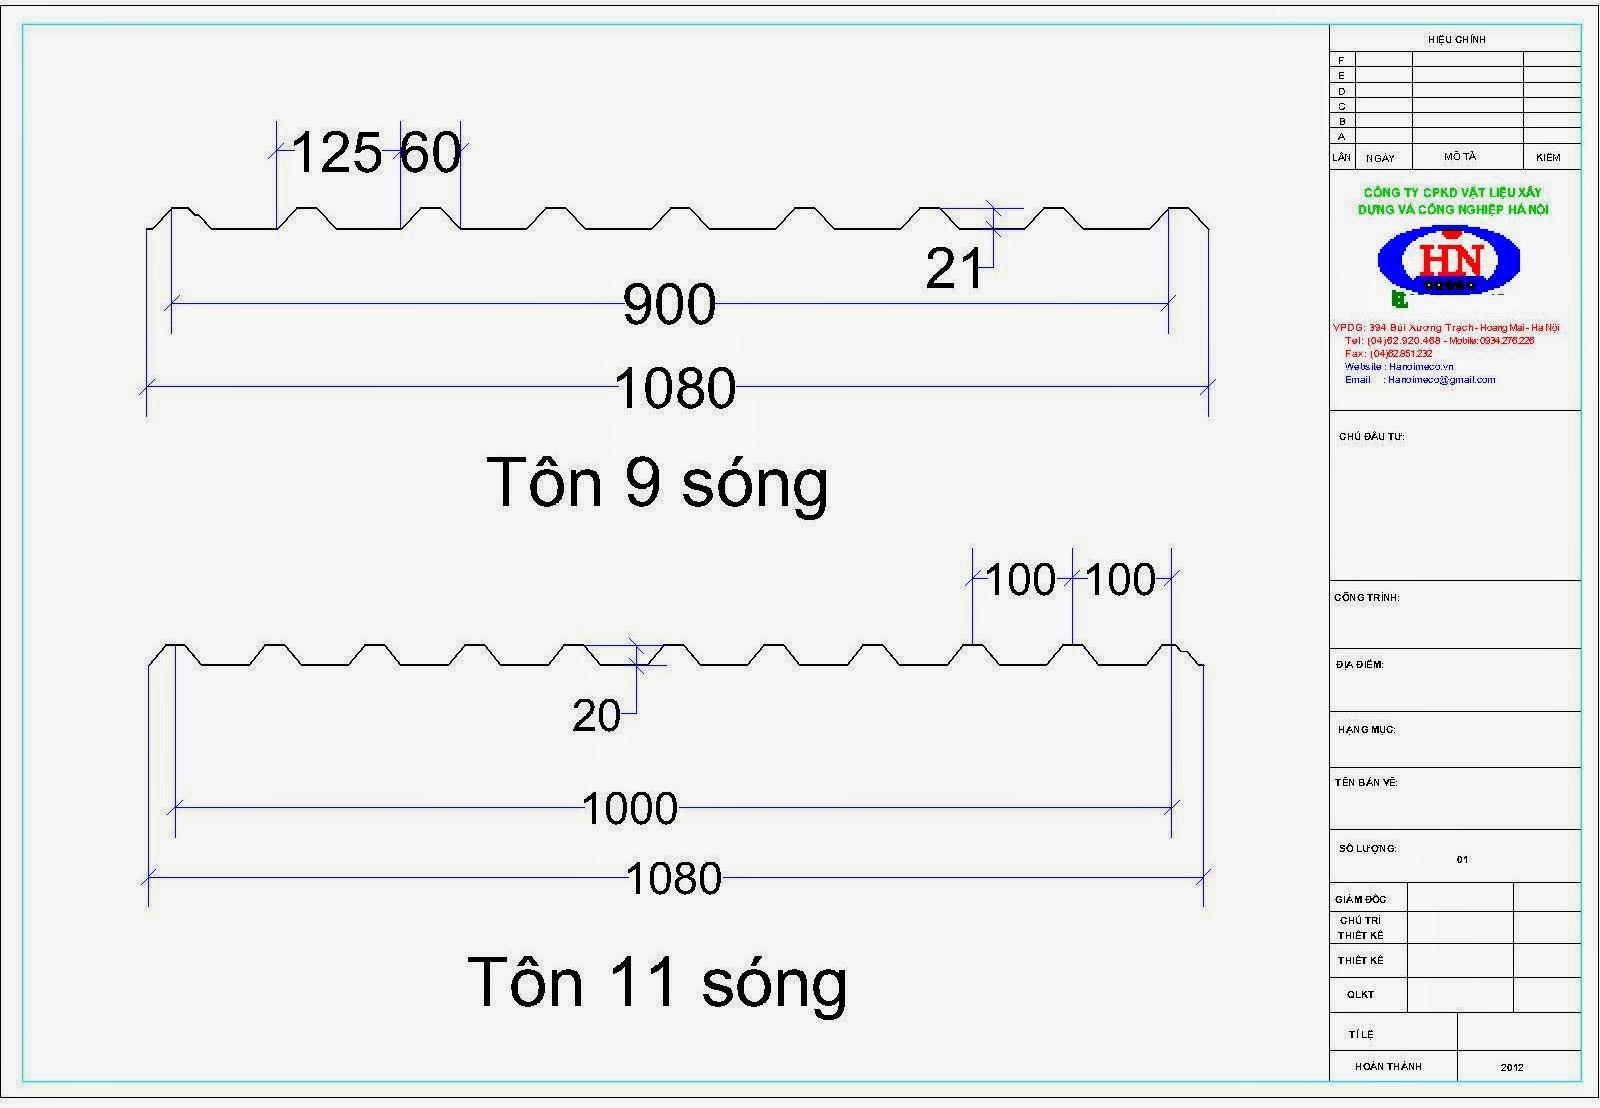 Biên dạng tôn 9 sóng | Biên dạng tôn 11 sóng